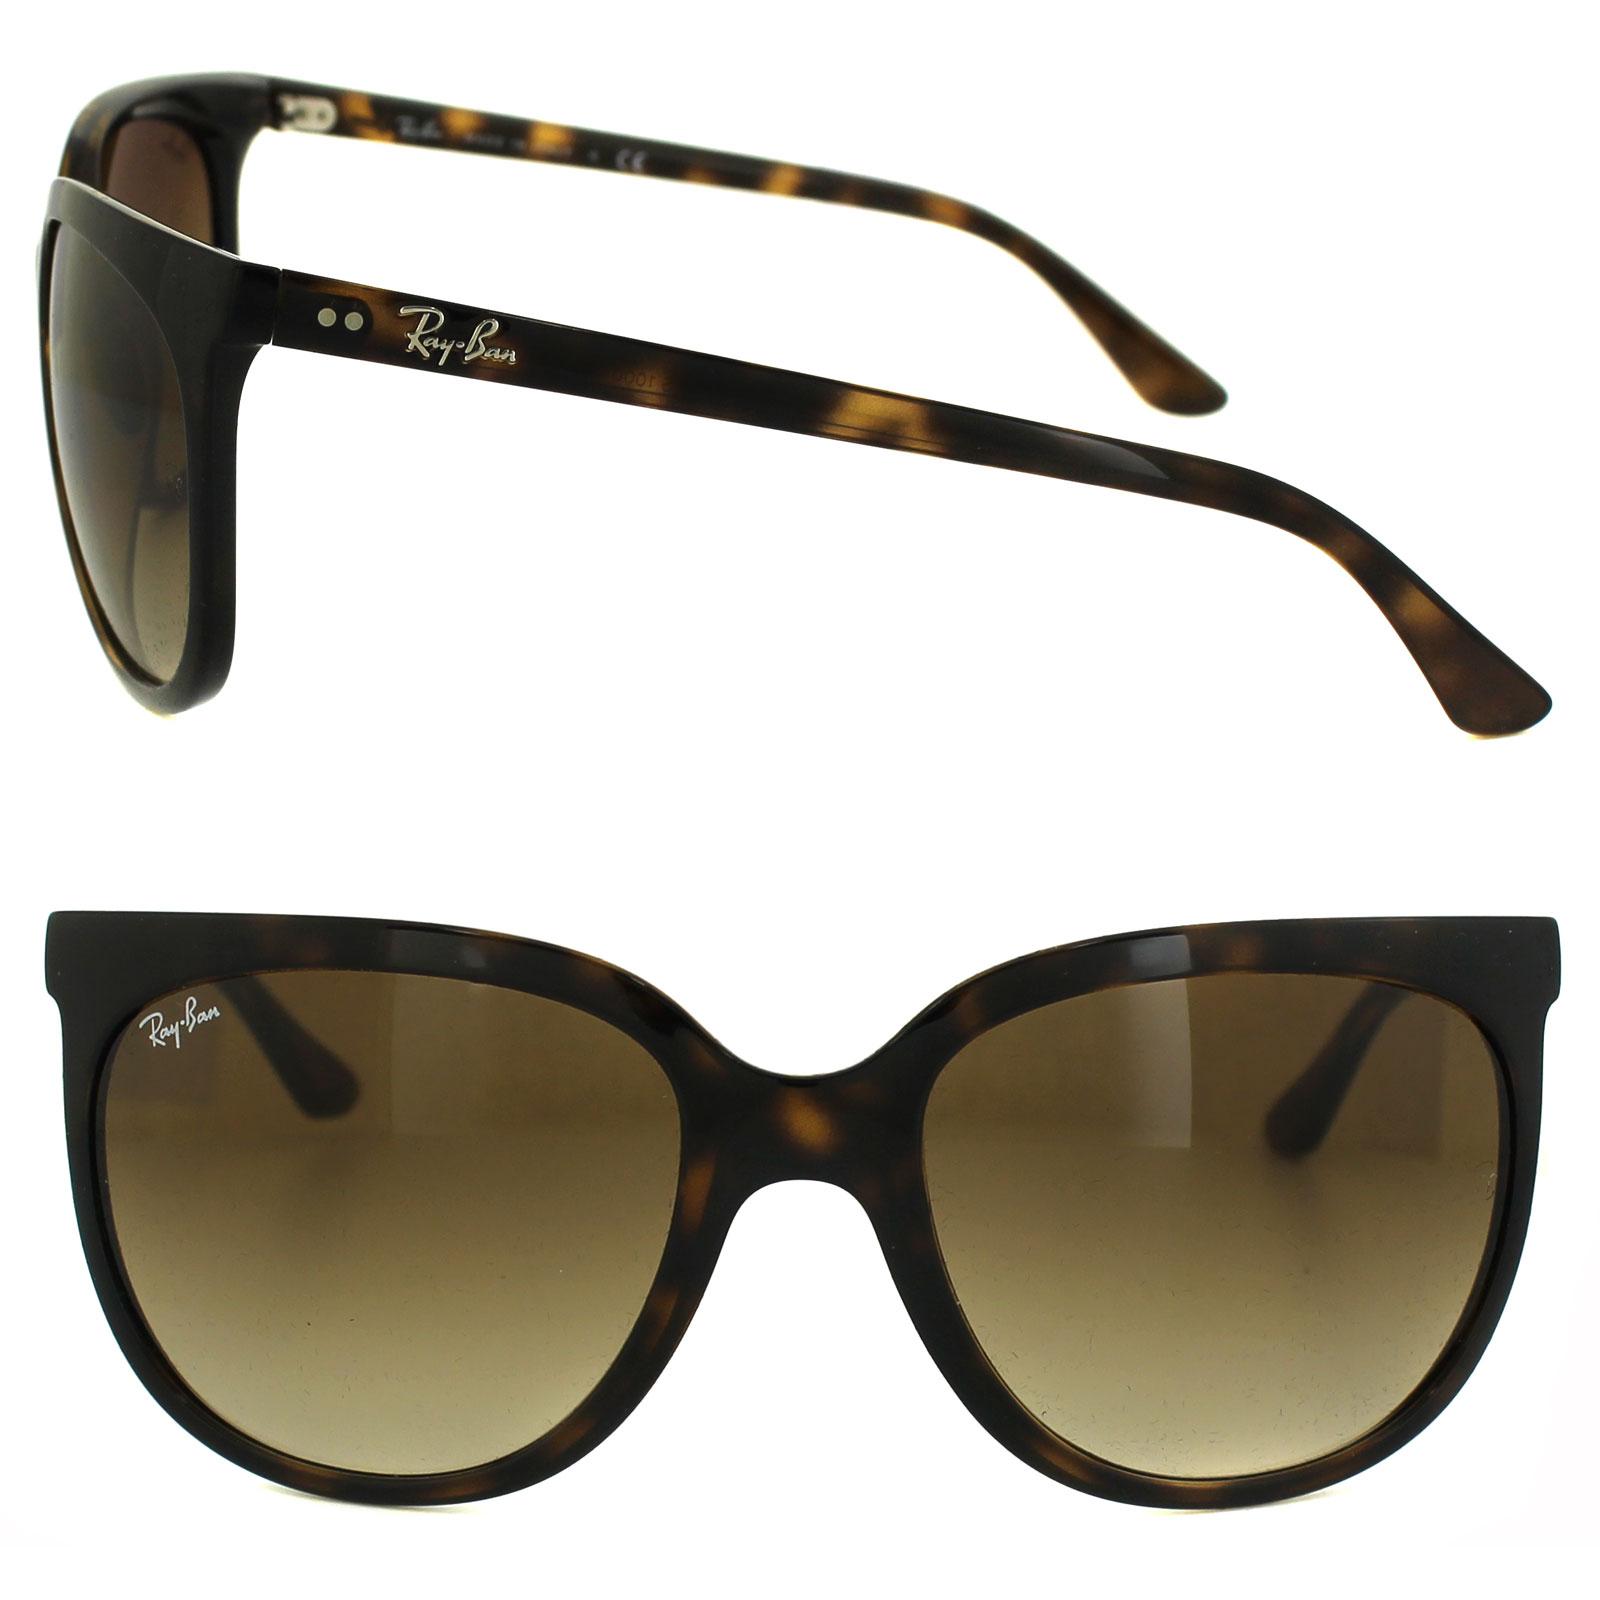 feb27e61141 Cheap Ray-Ban Cats 1000 4126 Sunglasses - Discounted Sunglasses